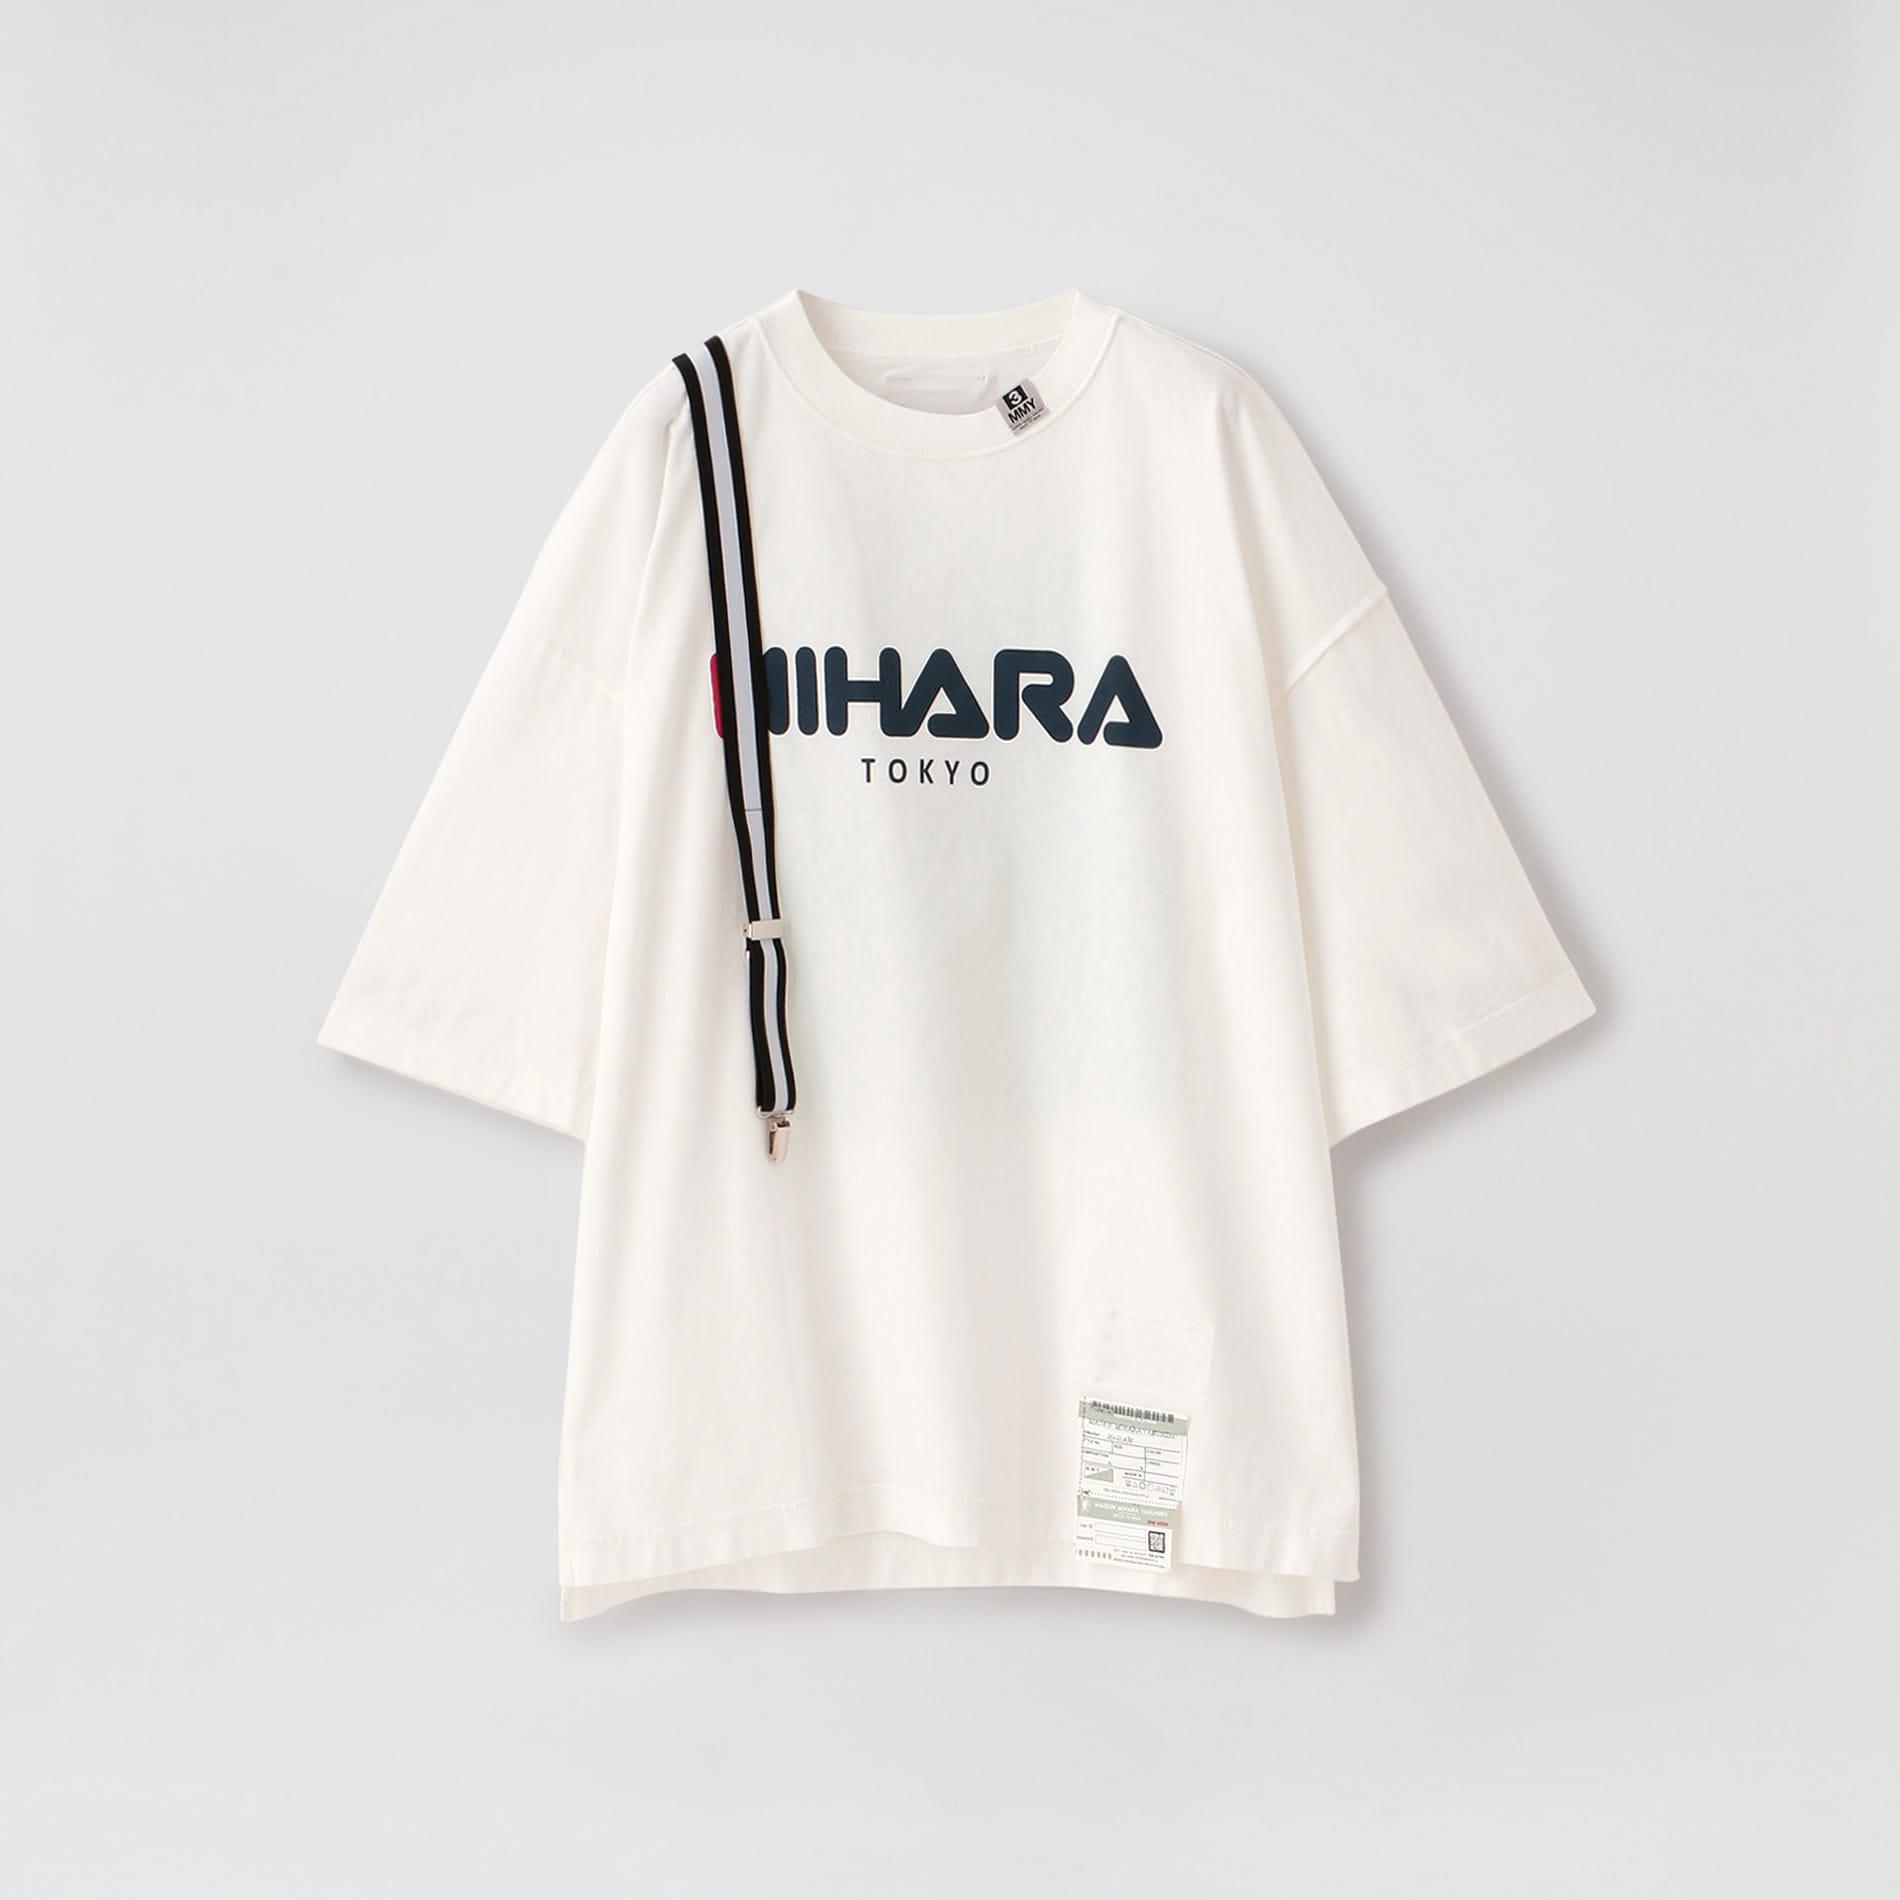 【Maison MIHARA YASUHIRO】MEN Suspender T-shirt A05TS651